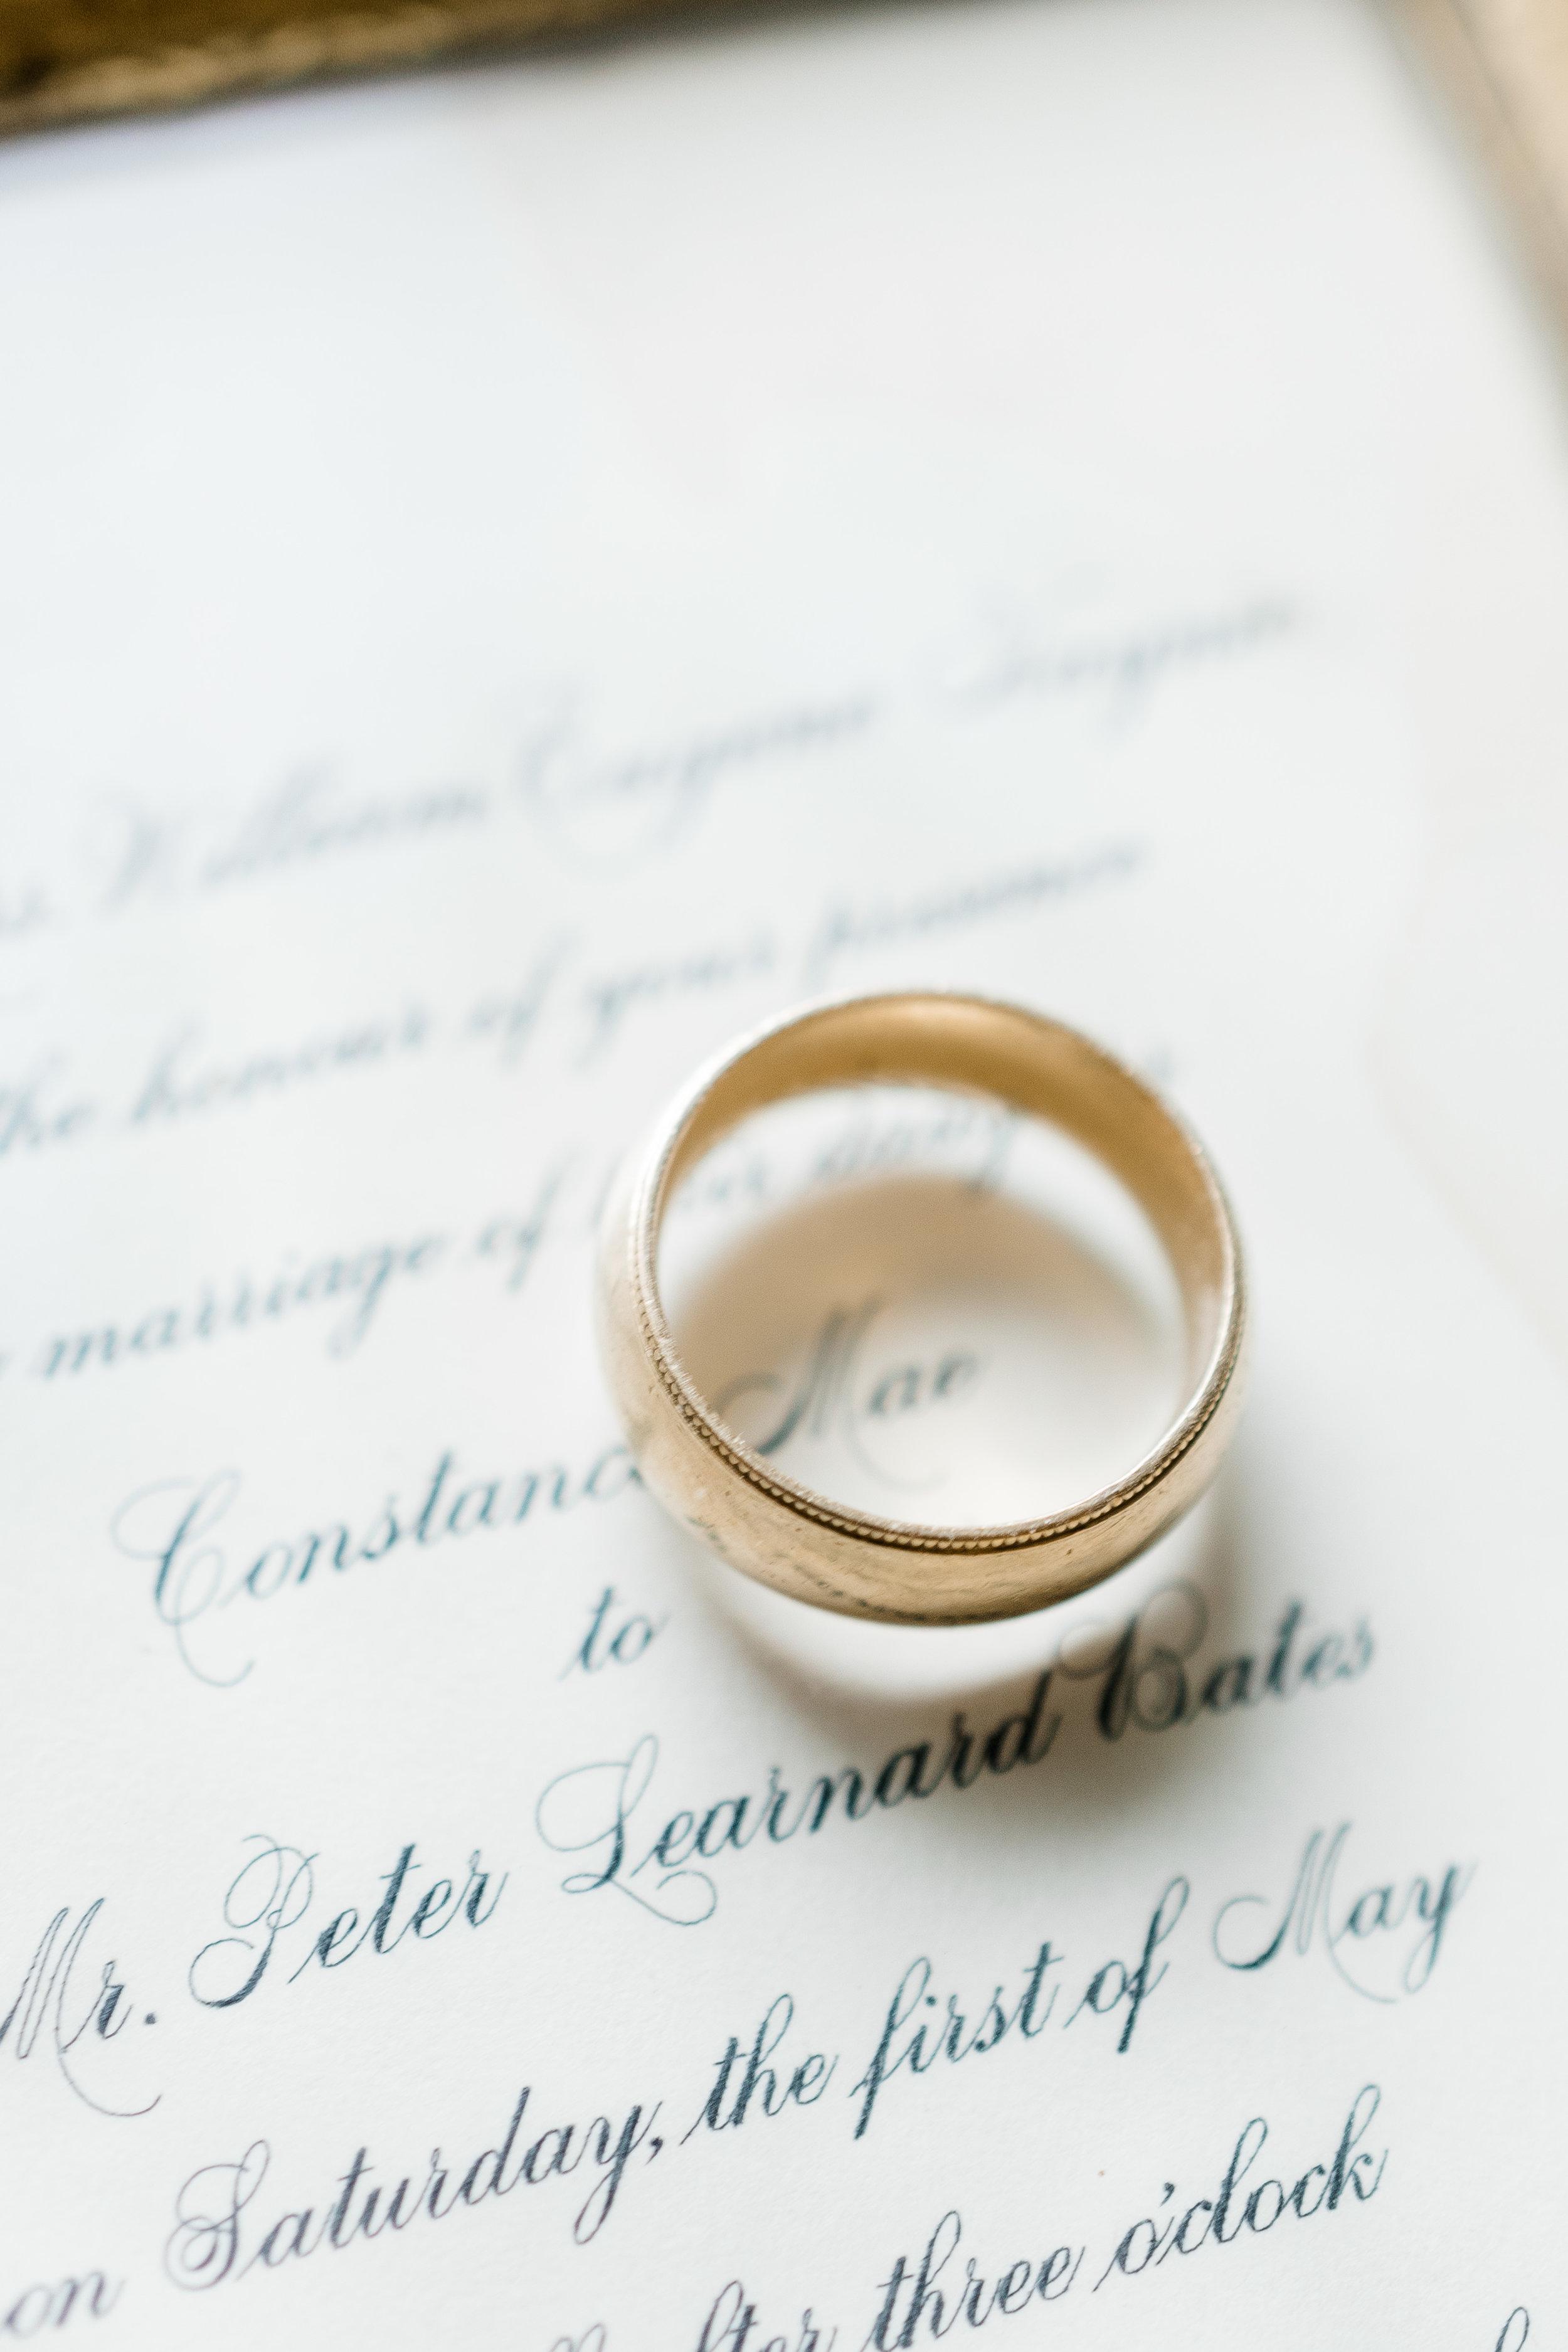 Anthony-and-stork-Weddings-60.jpg